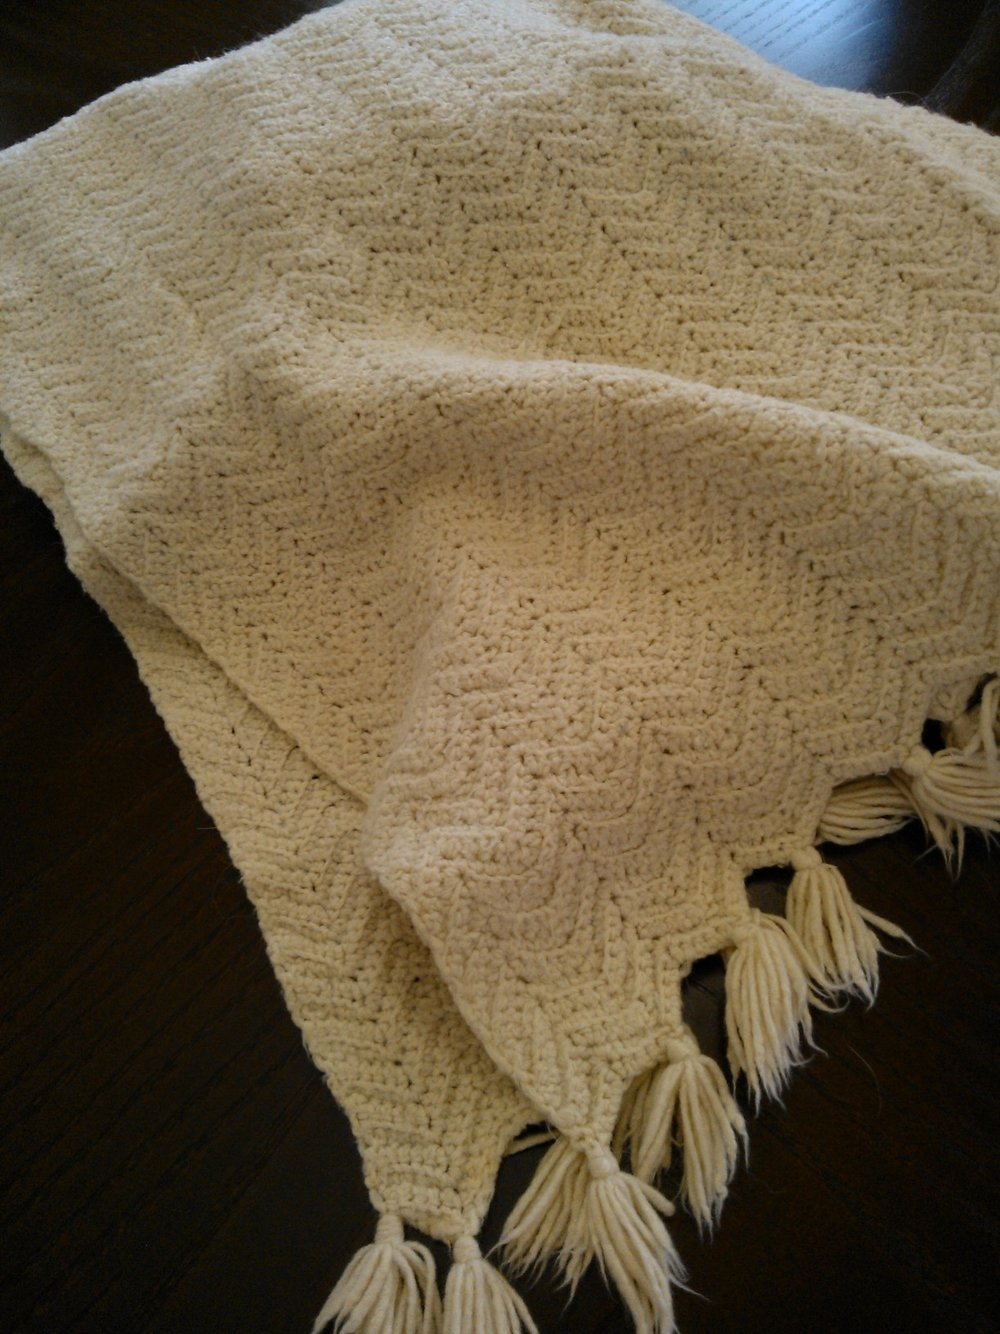 My baby blanket, crocheted by my Great Aunt Hazel. October 2012.